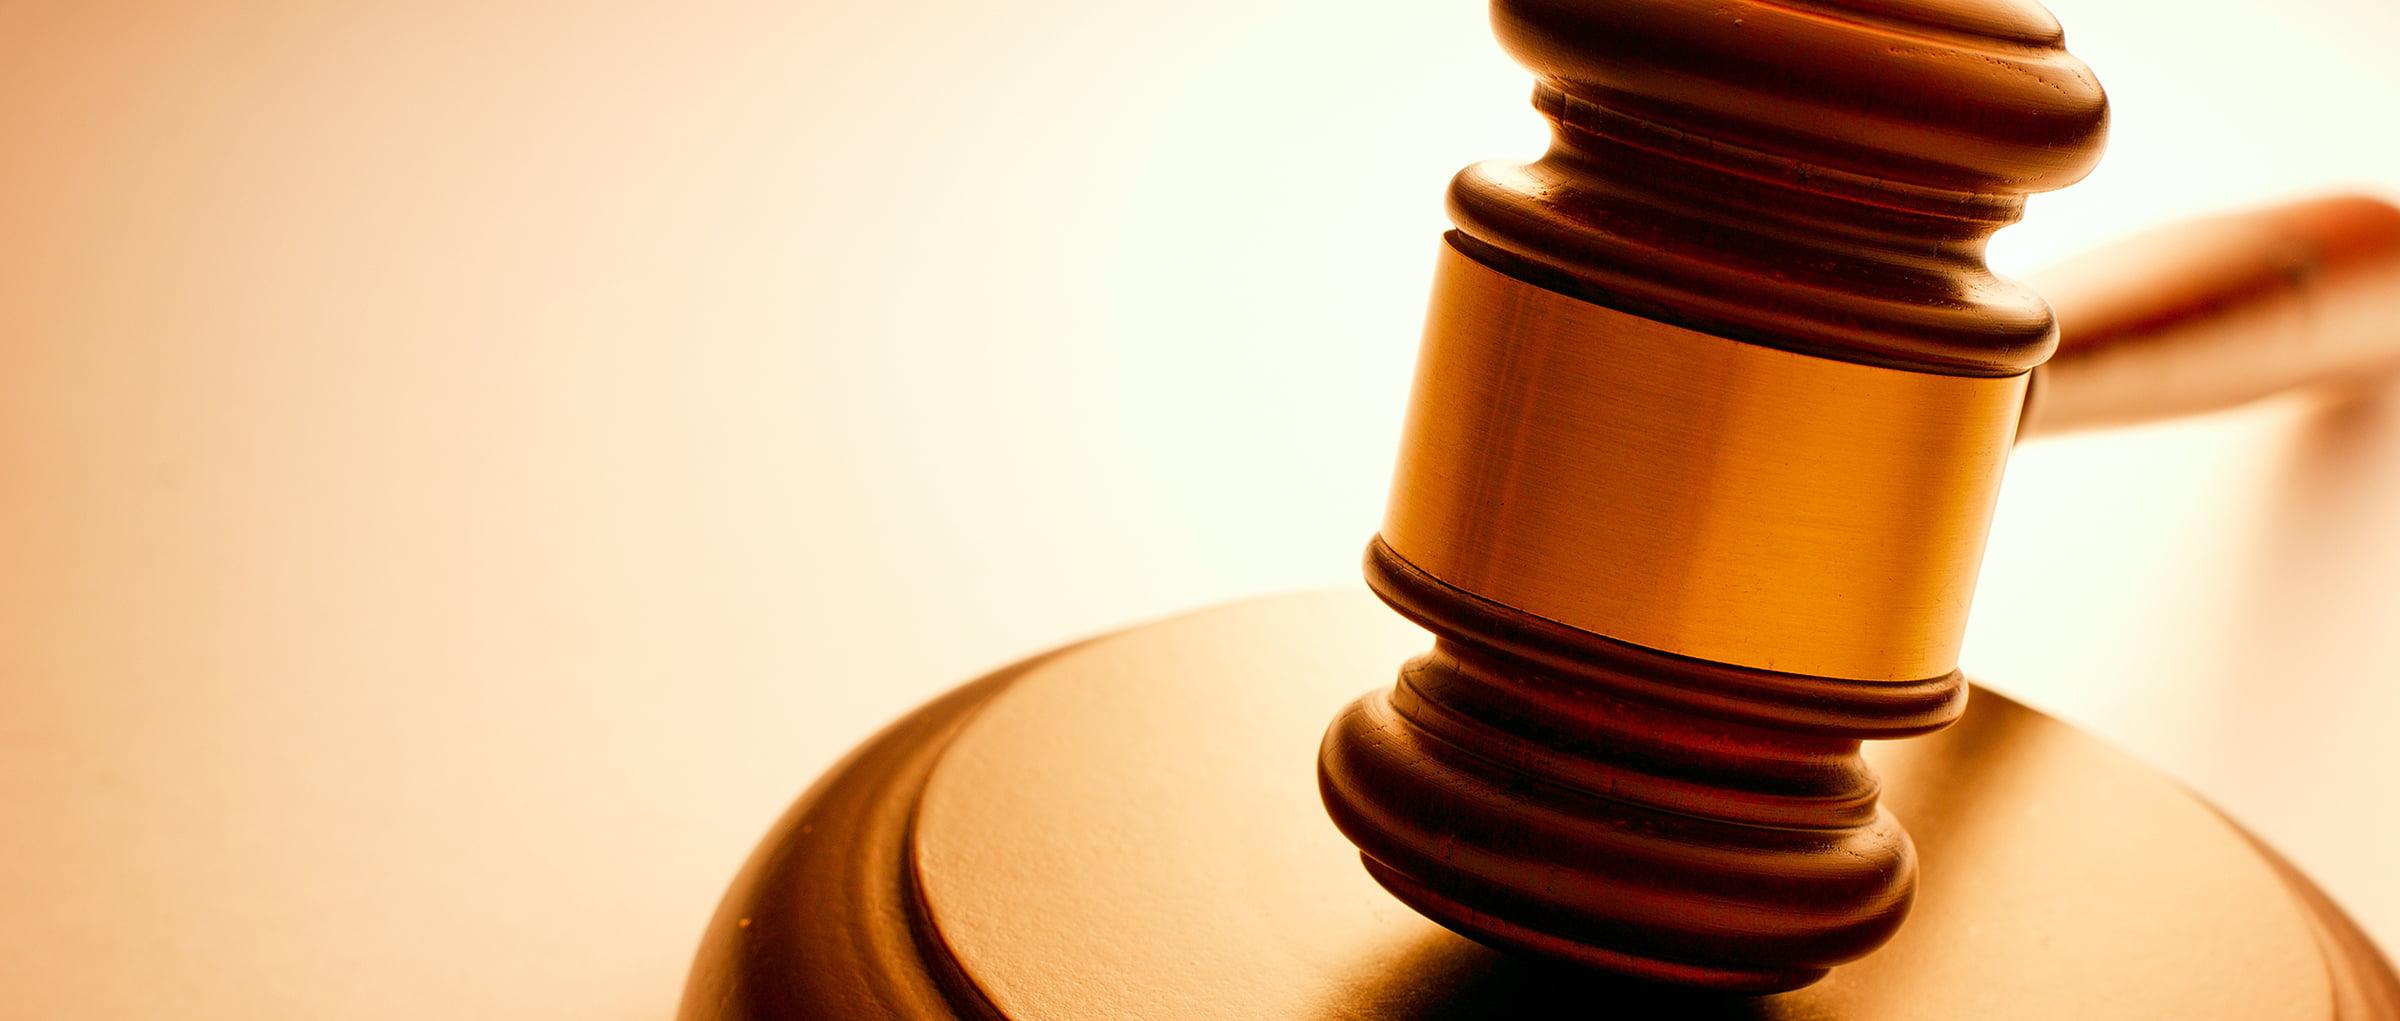 Modificación de ley